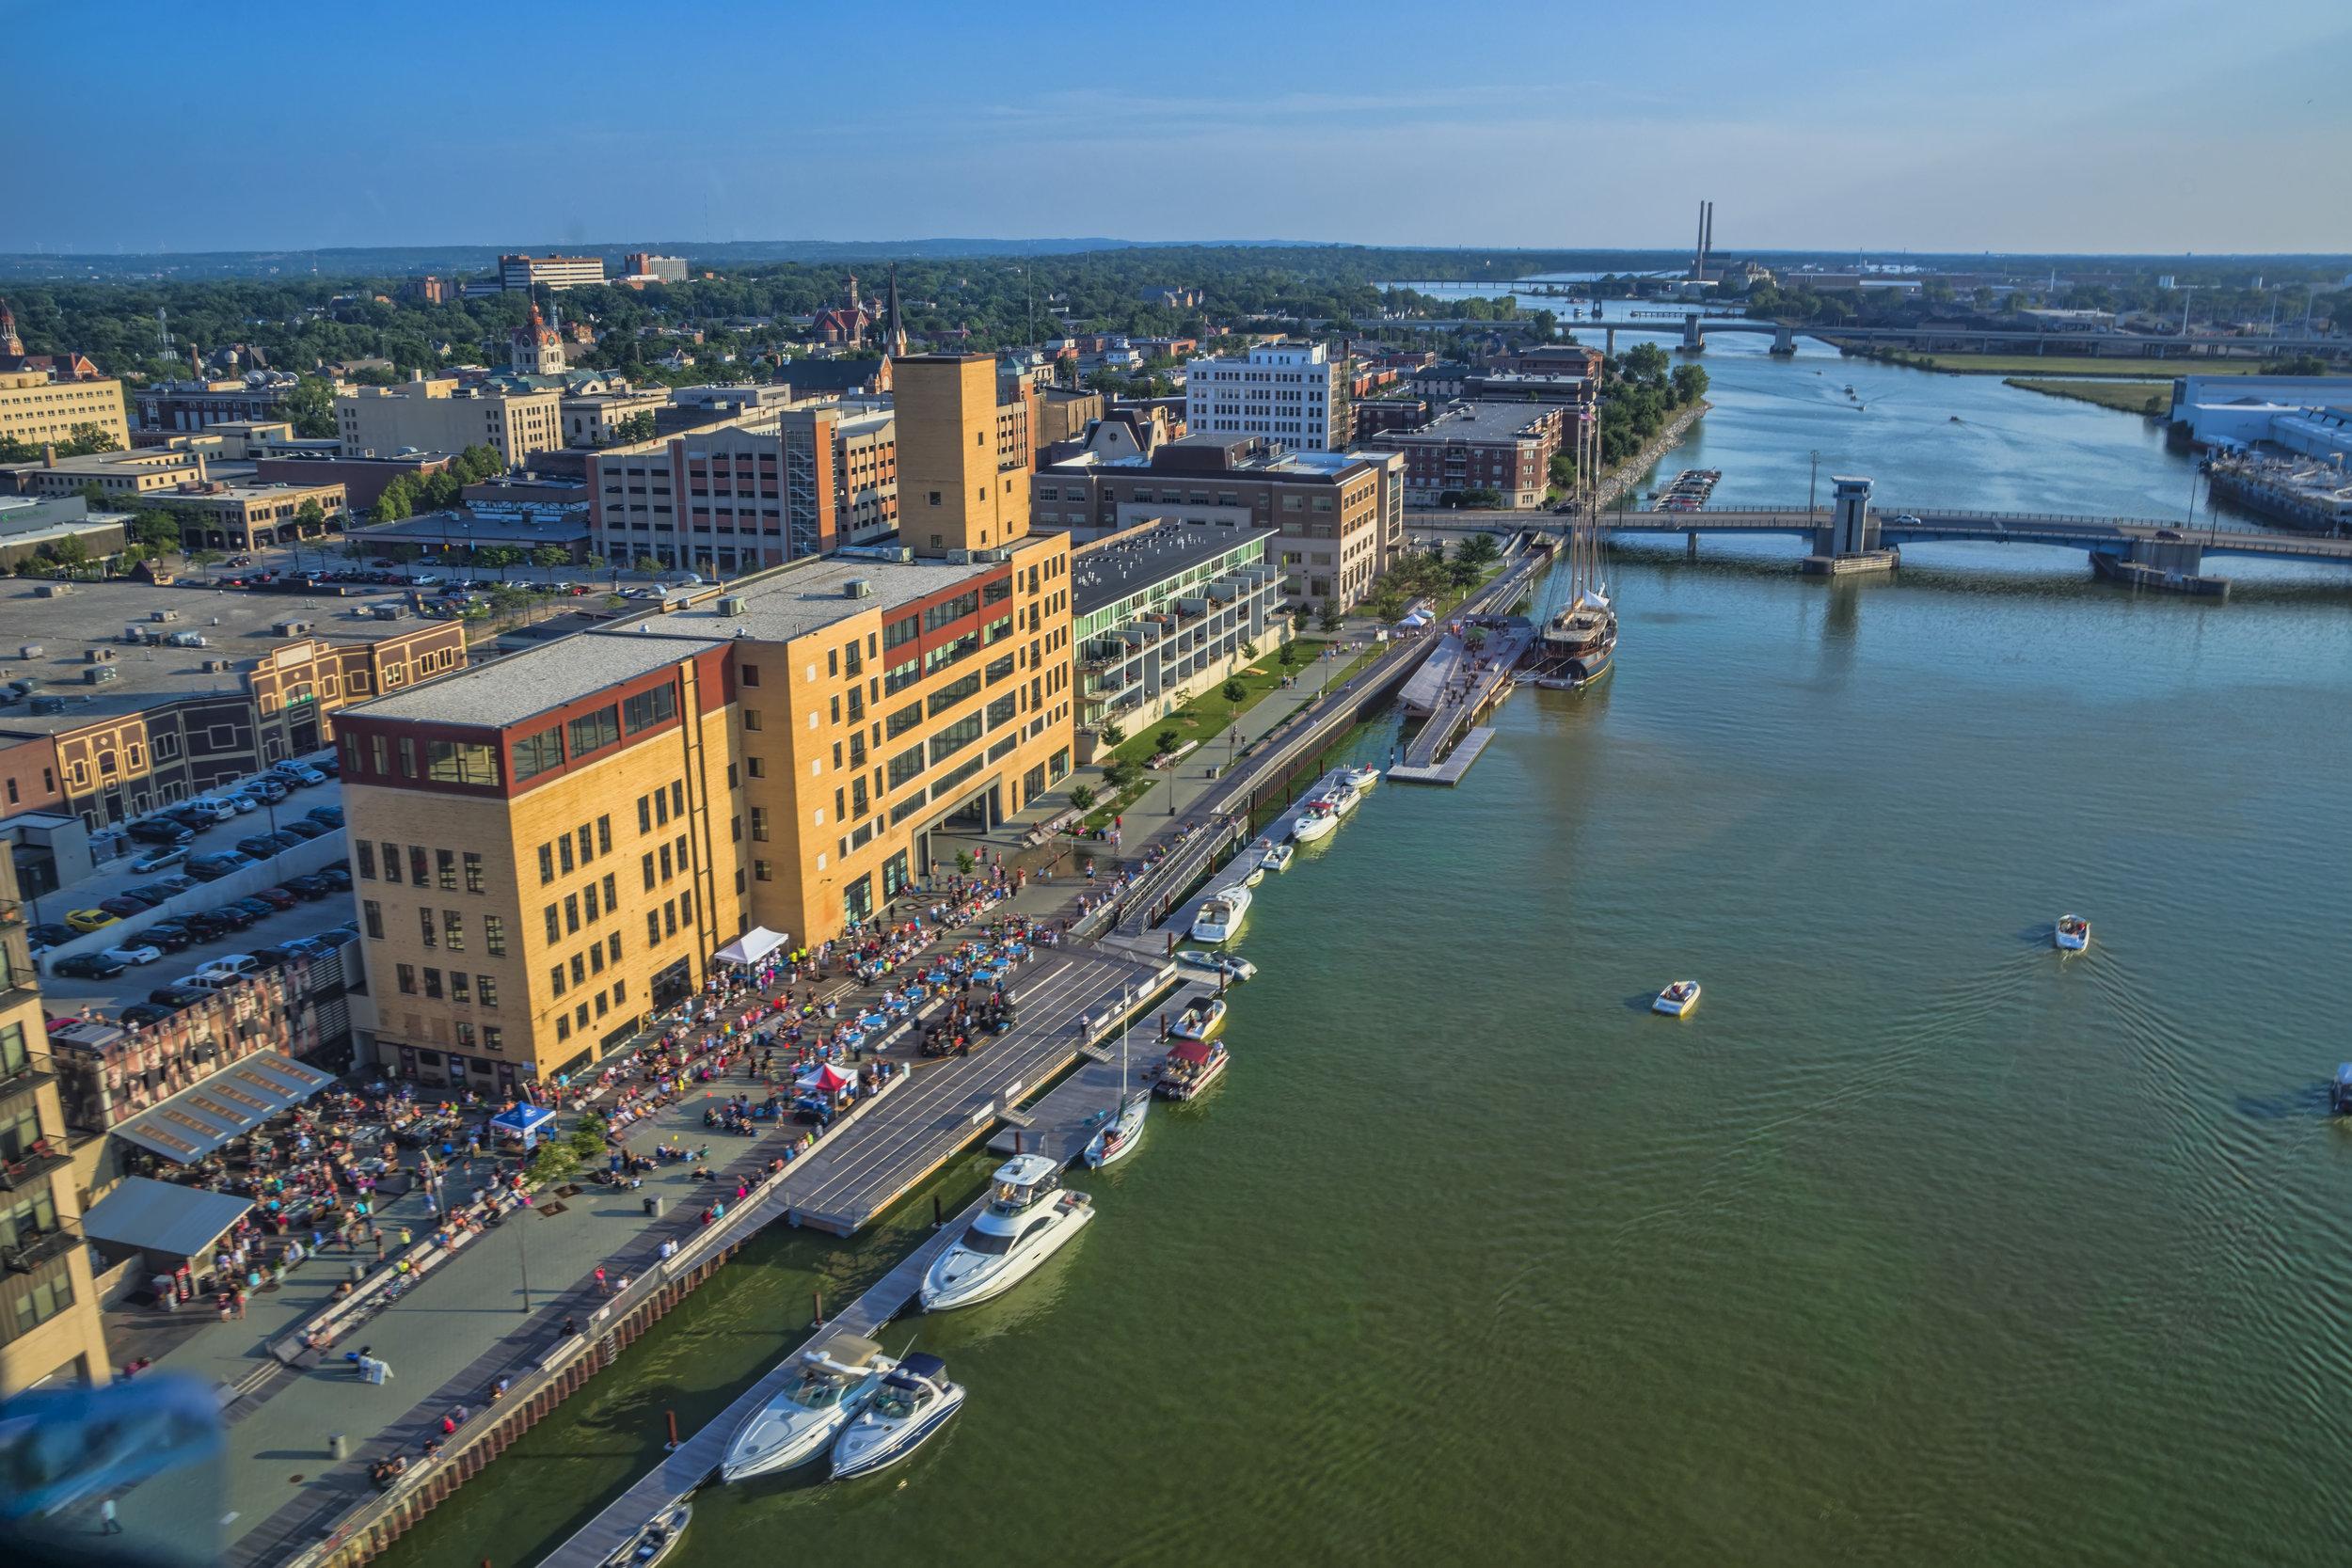 Downtown_Green_Bay_CityDeck_along_the_Fox_River.jpg